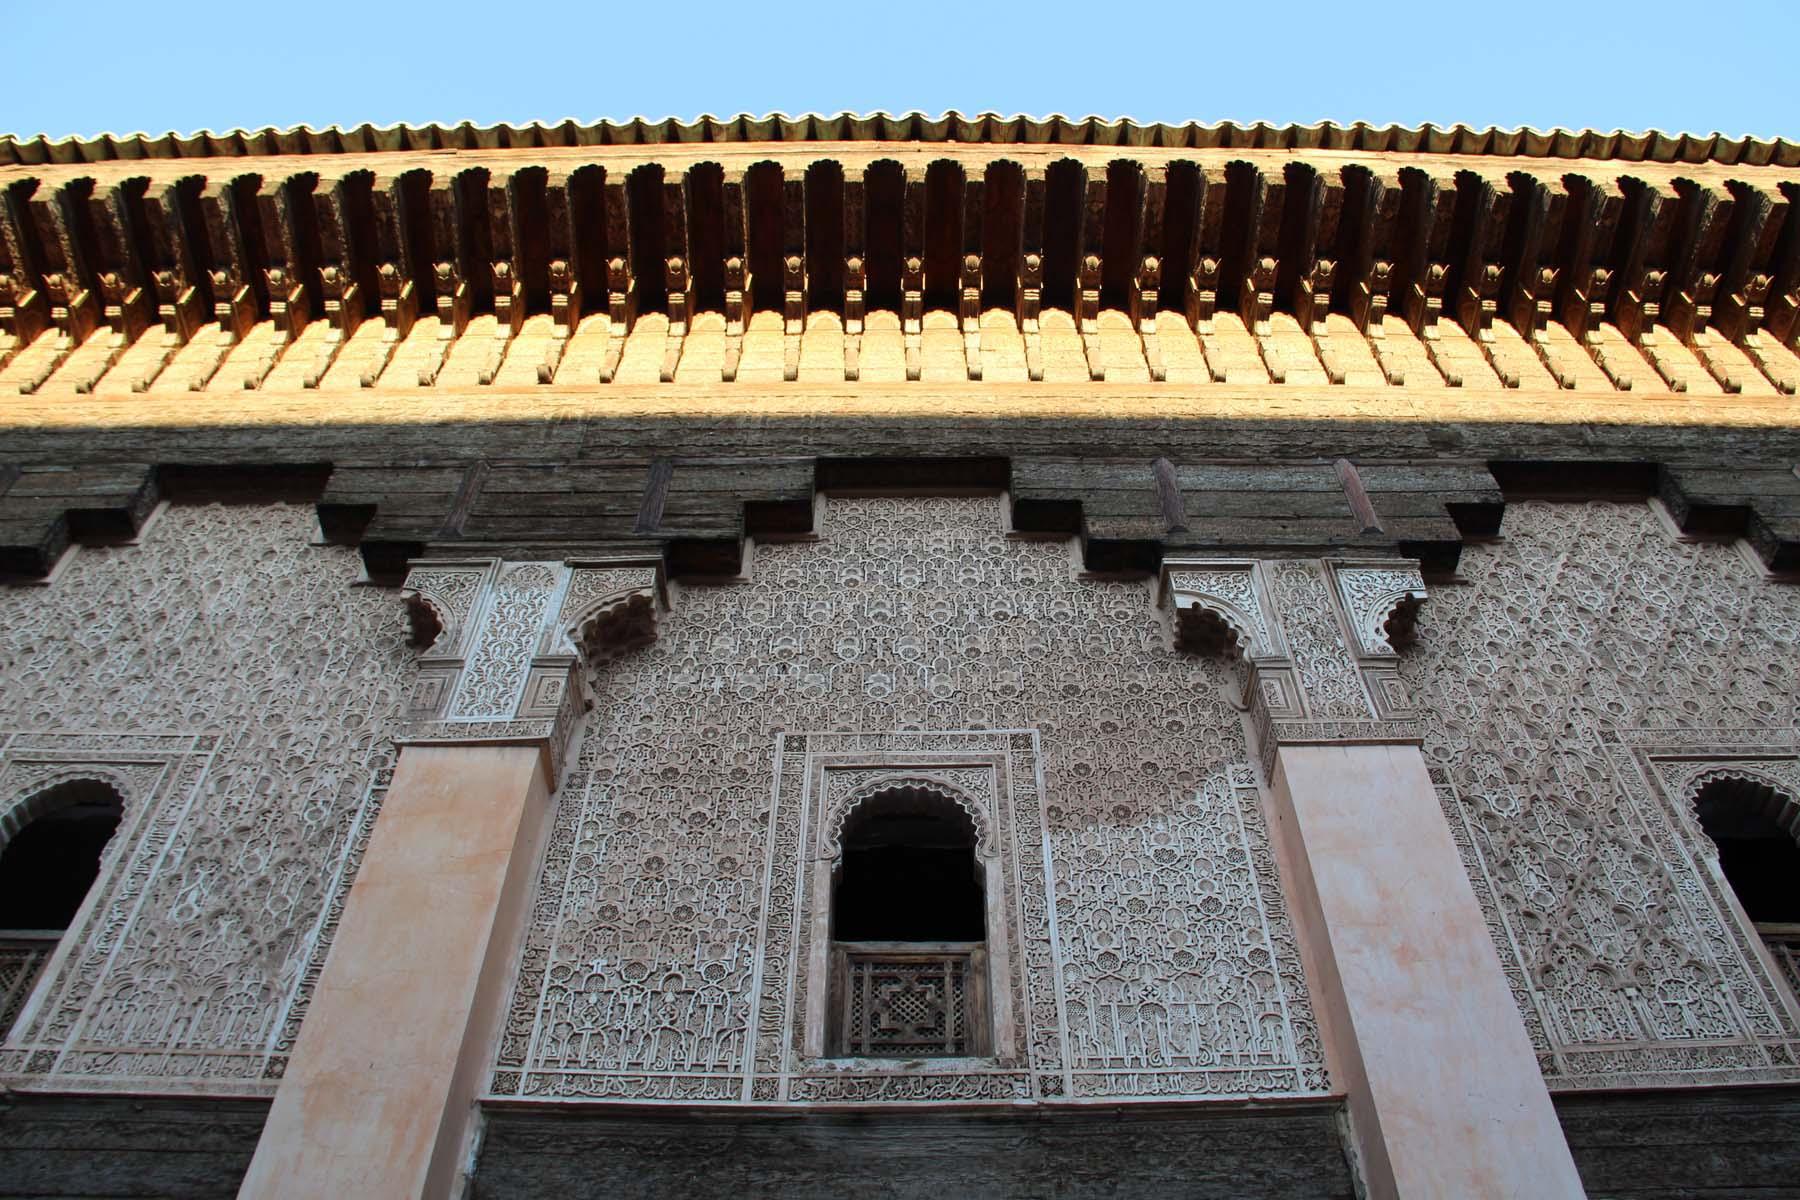 Facade of the Ben Youssef Madrasa in Marrakech